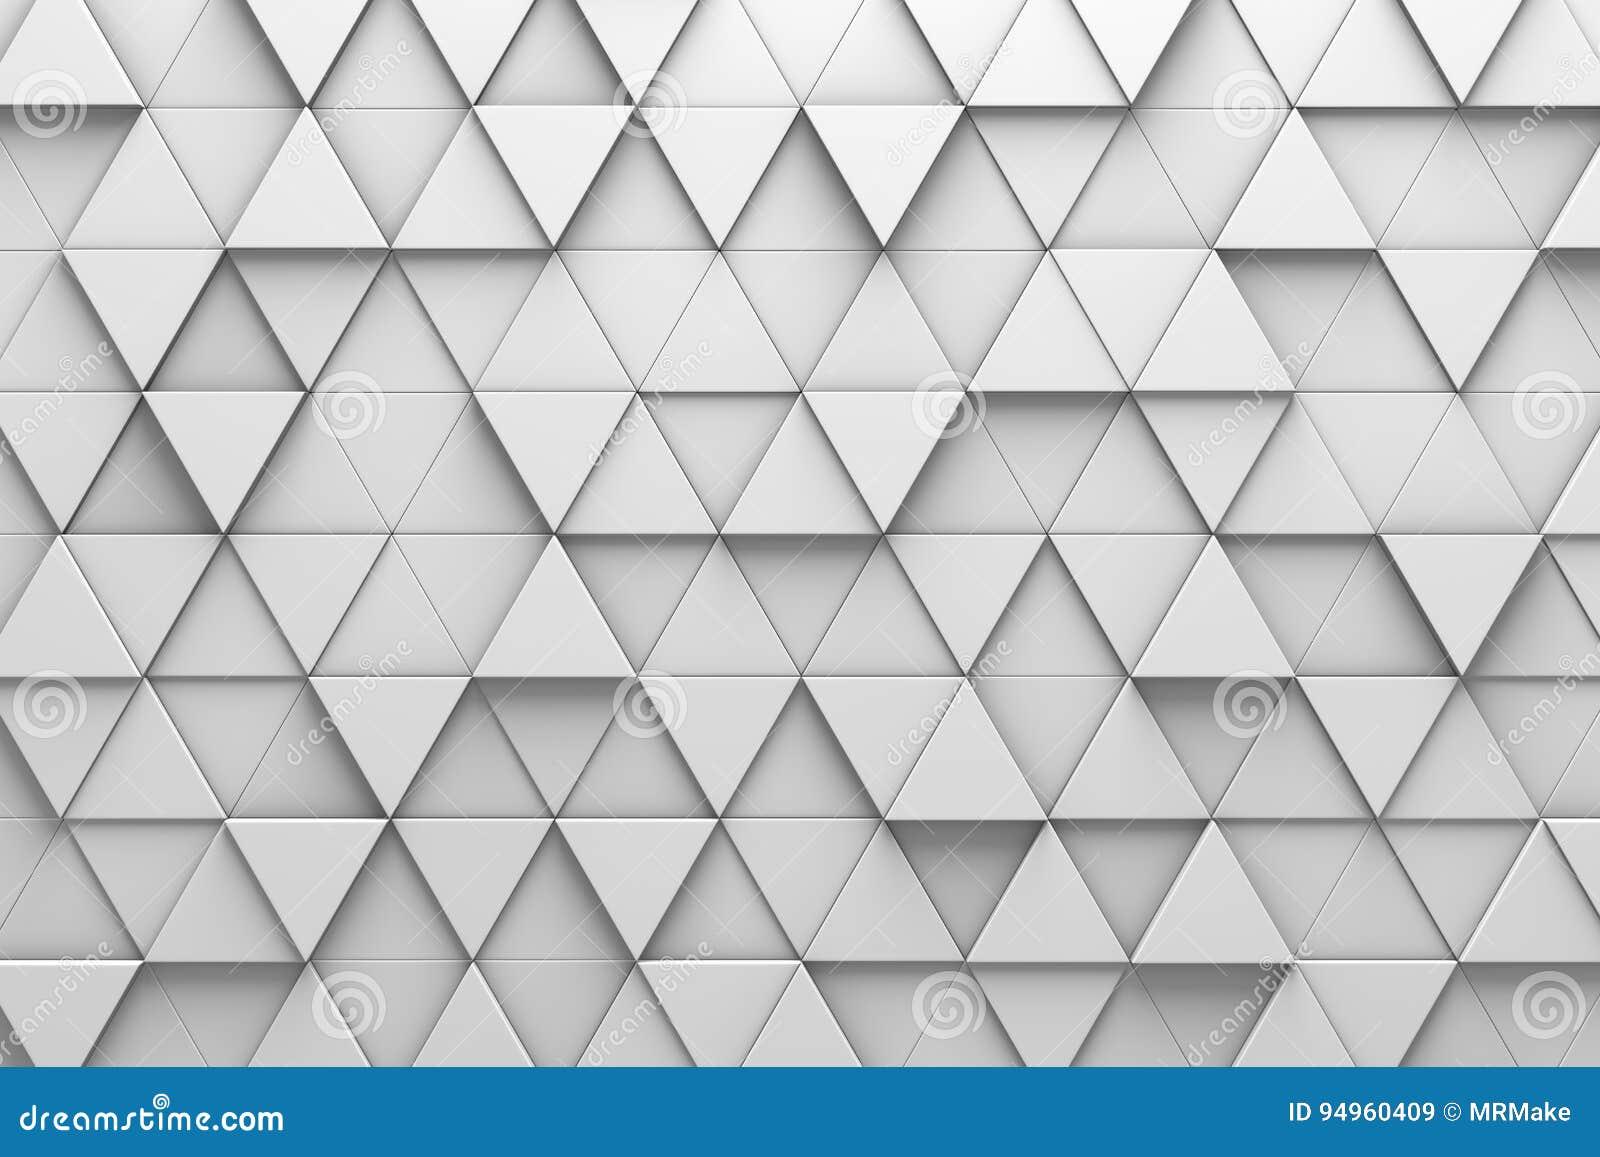 Dreieckige muster wand der fliesen 3d stock abbildung illustration von gelegentlich - Muster an wand ...